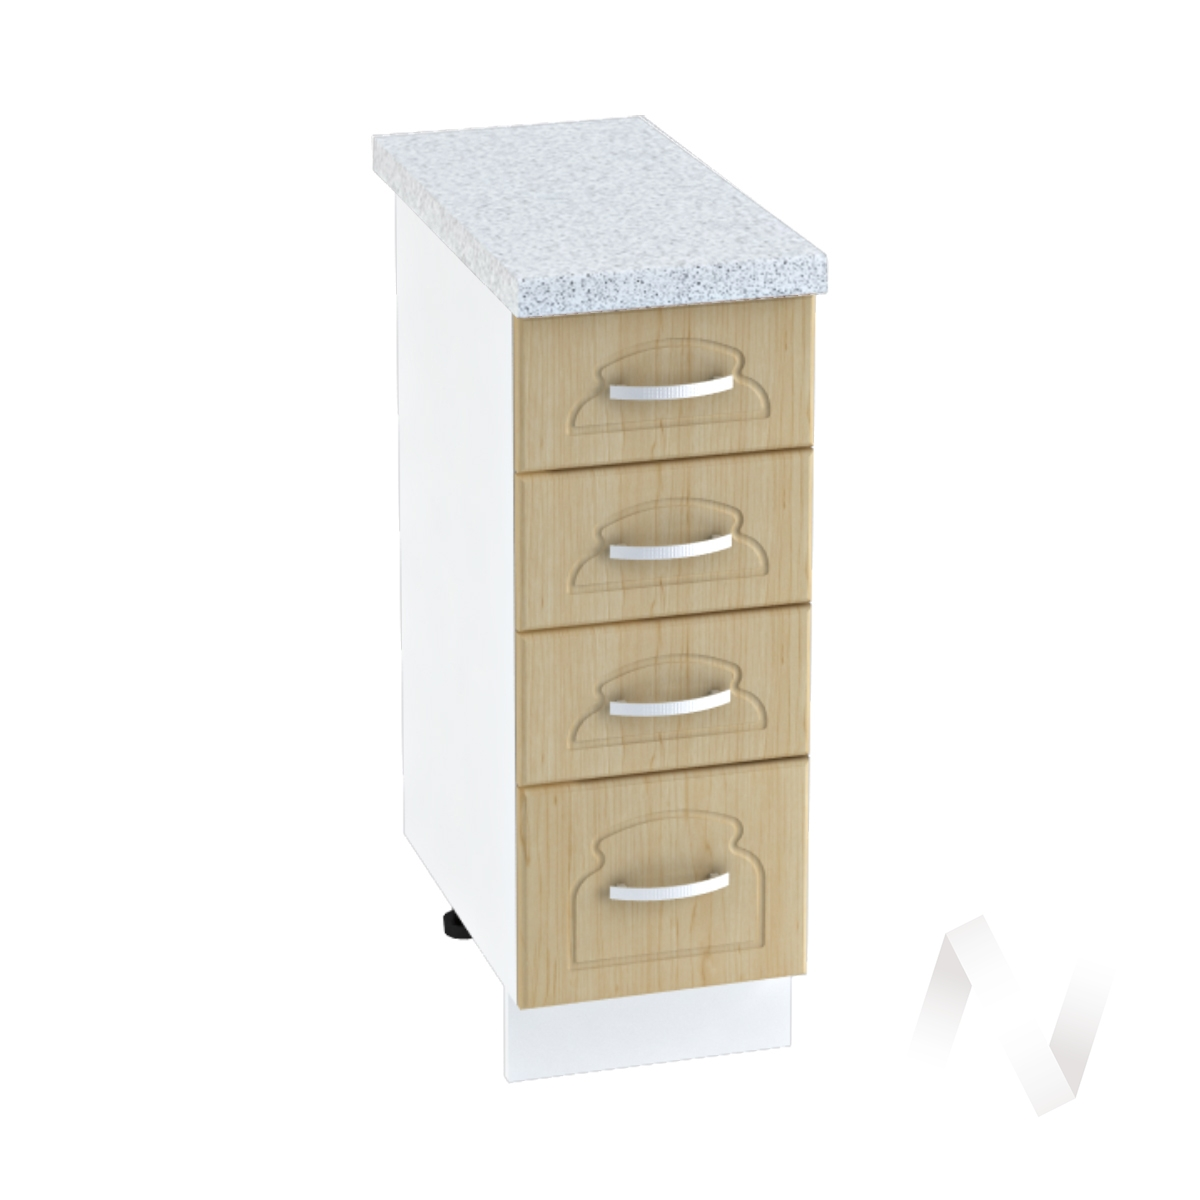 "Кухня ""Настя"": Шкаф нижний с 4-мя ящиками 300, ШН4Я 300 (Береза/корпус белый)"